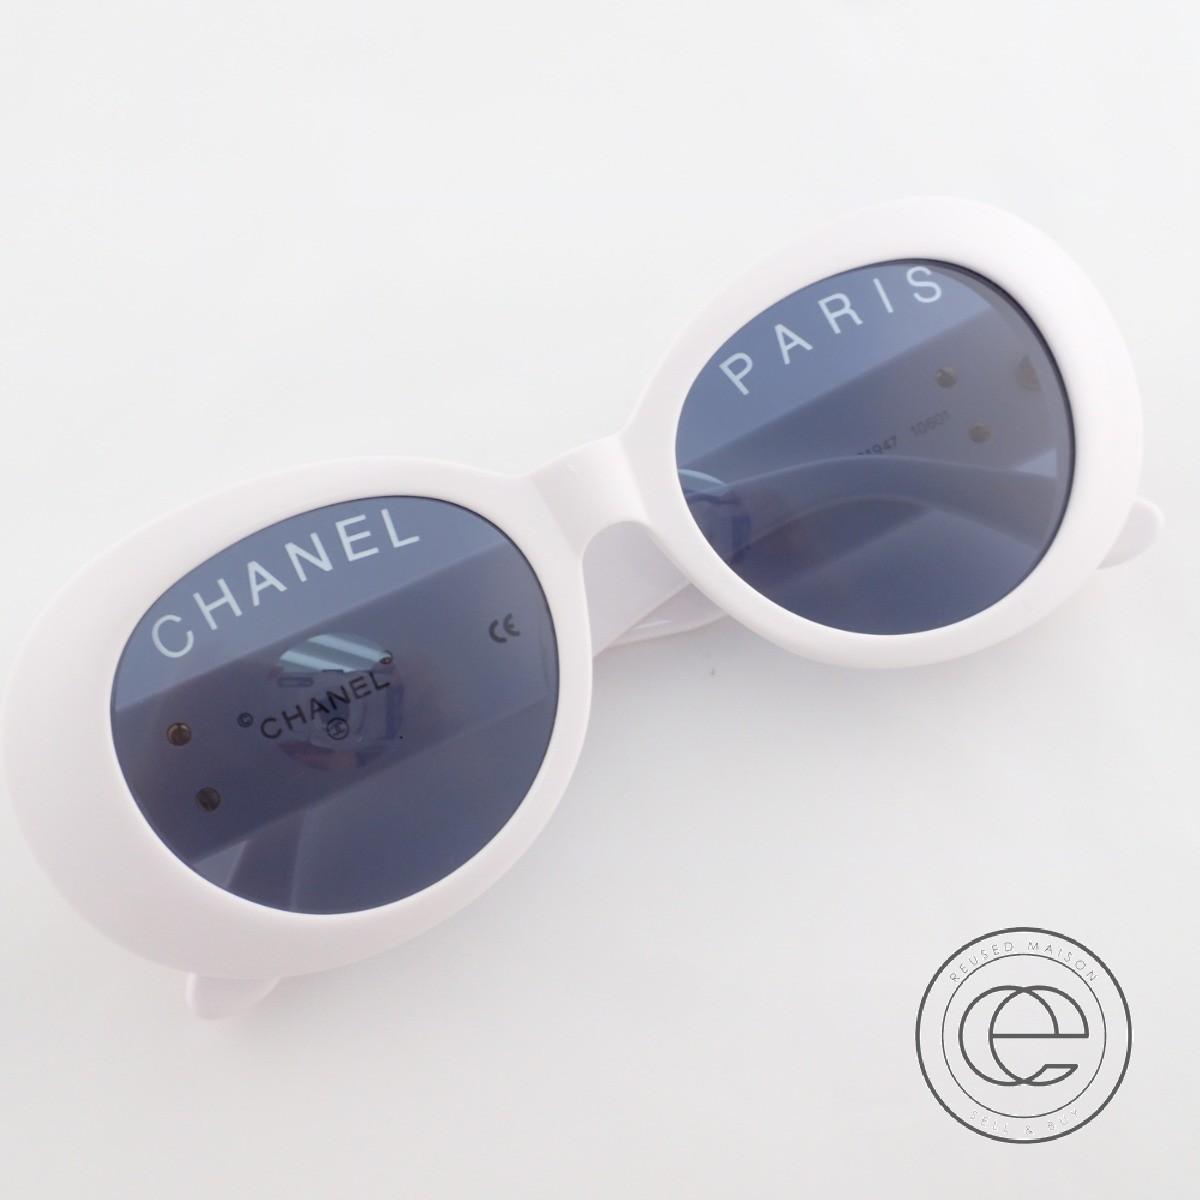 CHANEL シャネル 01947 10601 CC ココマーク オーバル ロゴレンズ サングラス ホワイト レディース 【中古】